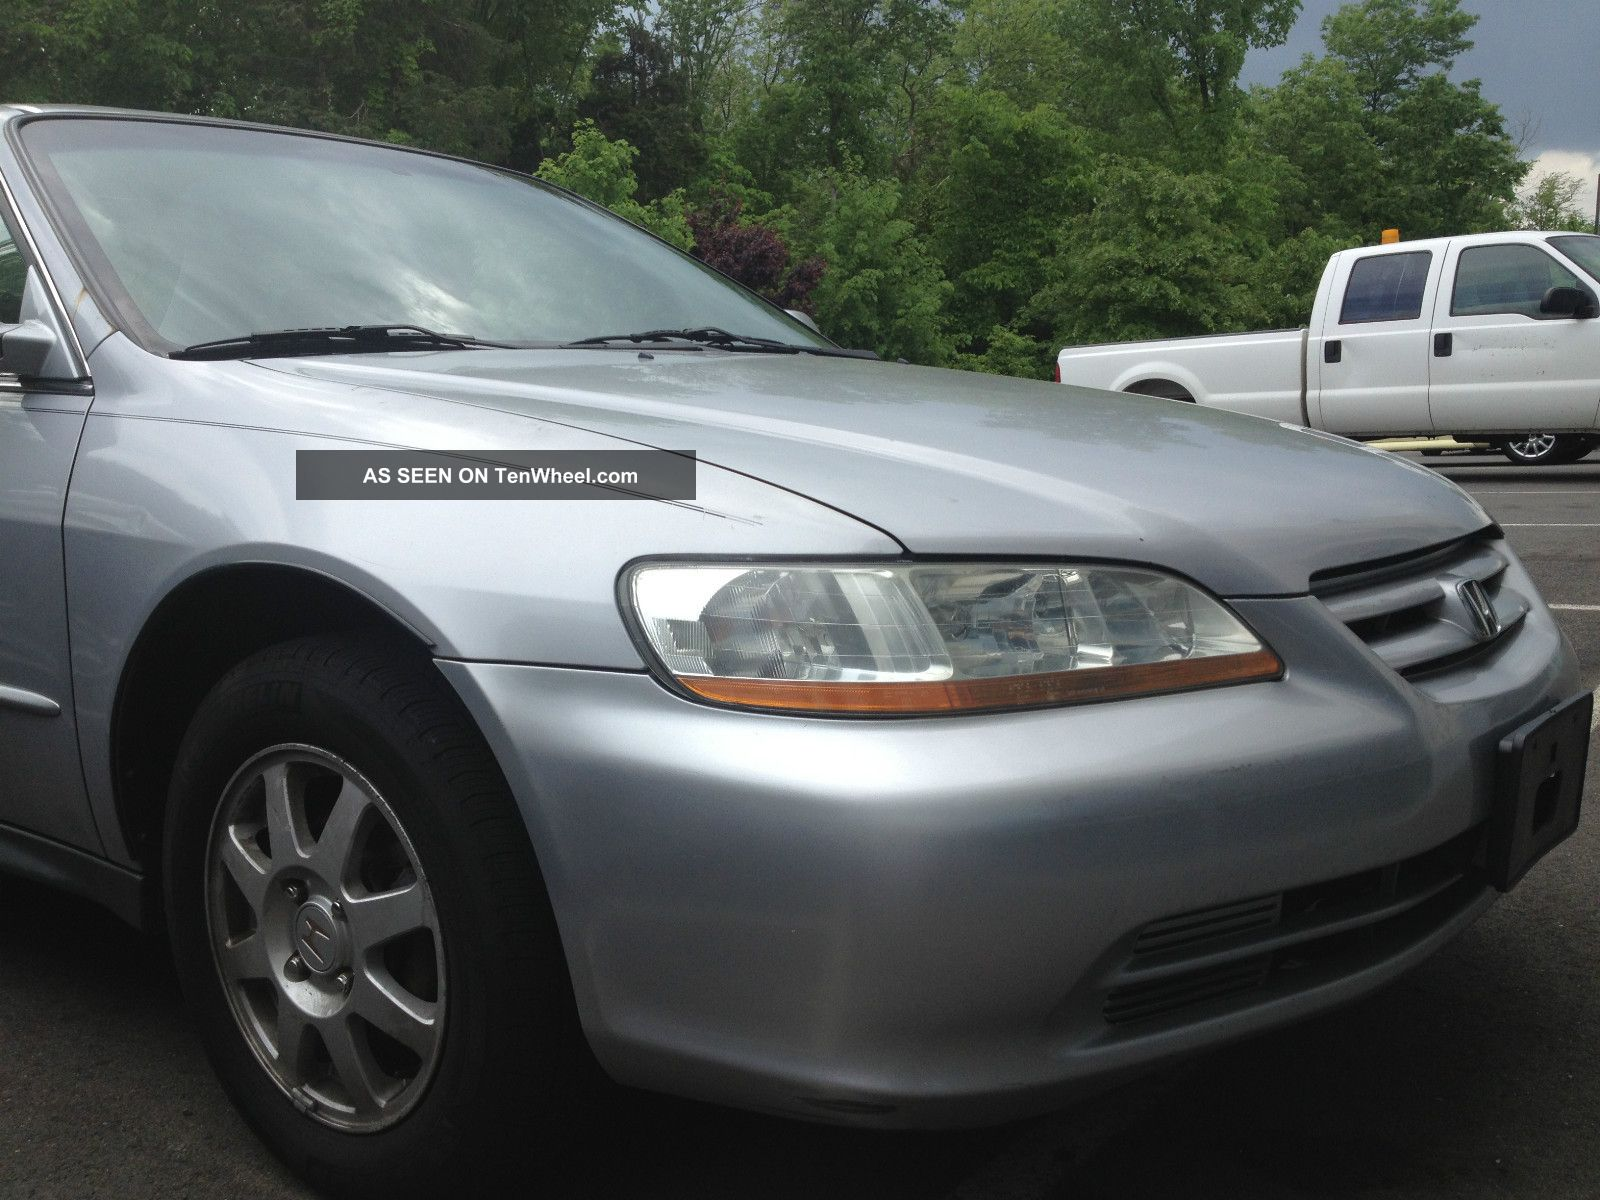 2002 Honda Accord Se,  4 Cylinder,  Rebuild Auto Transmission. Accord photo